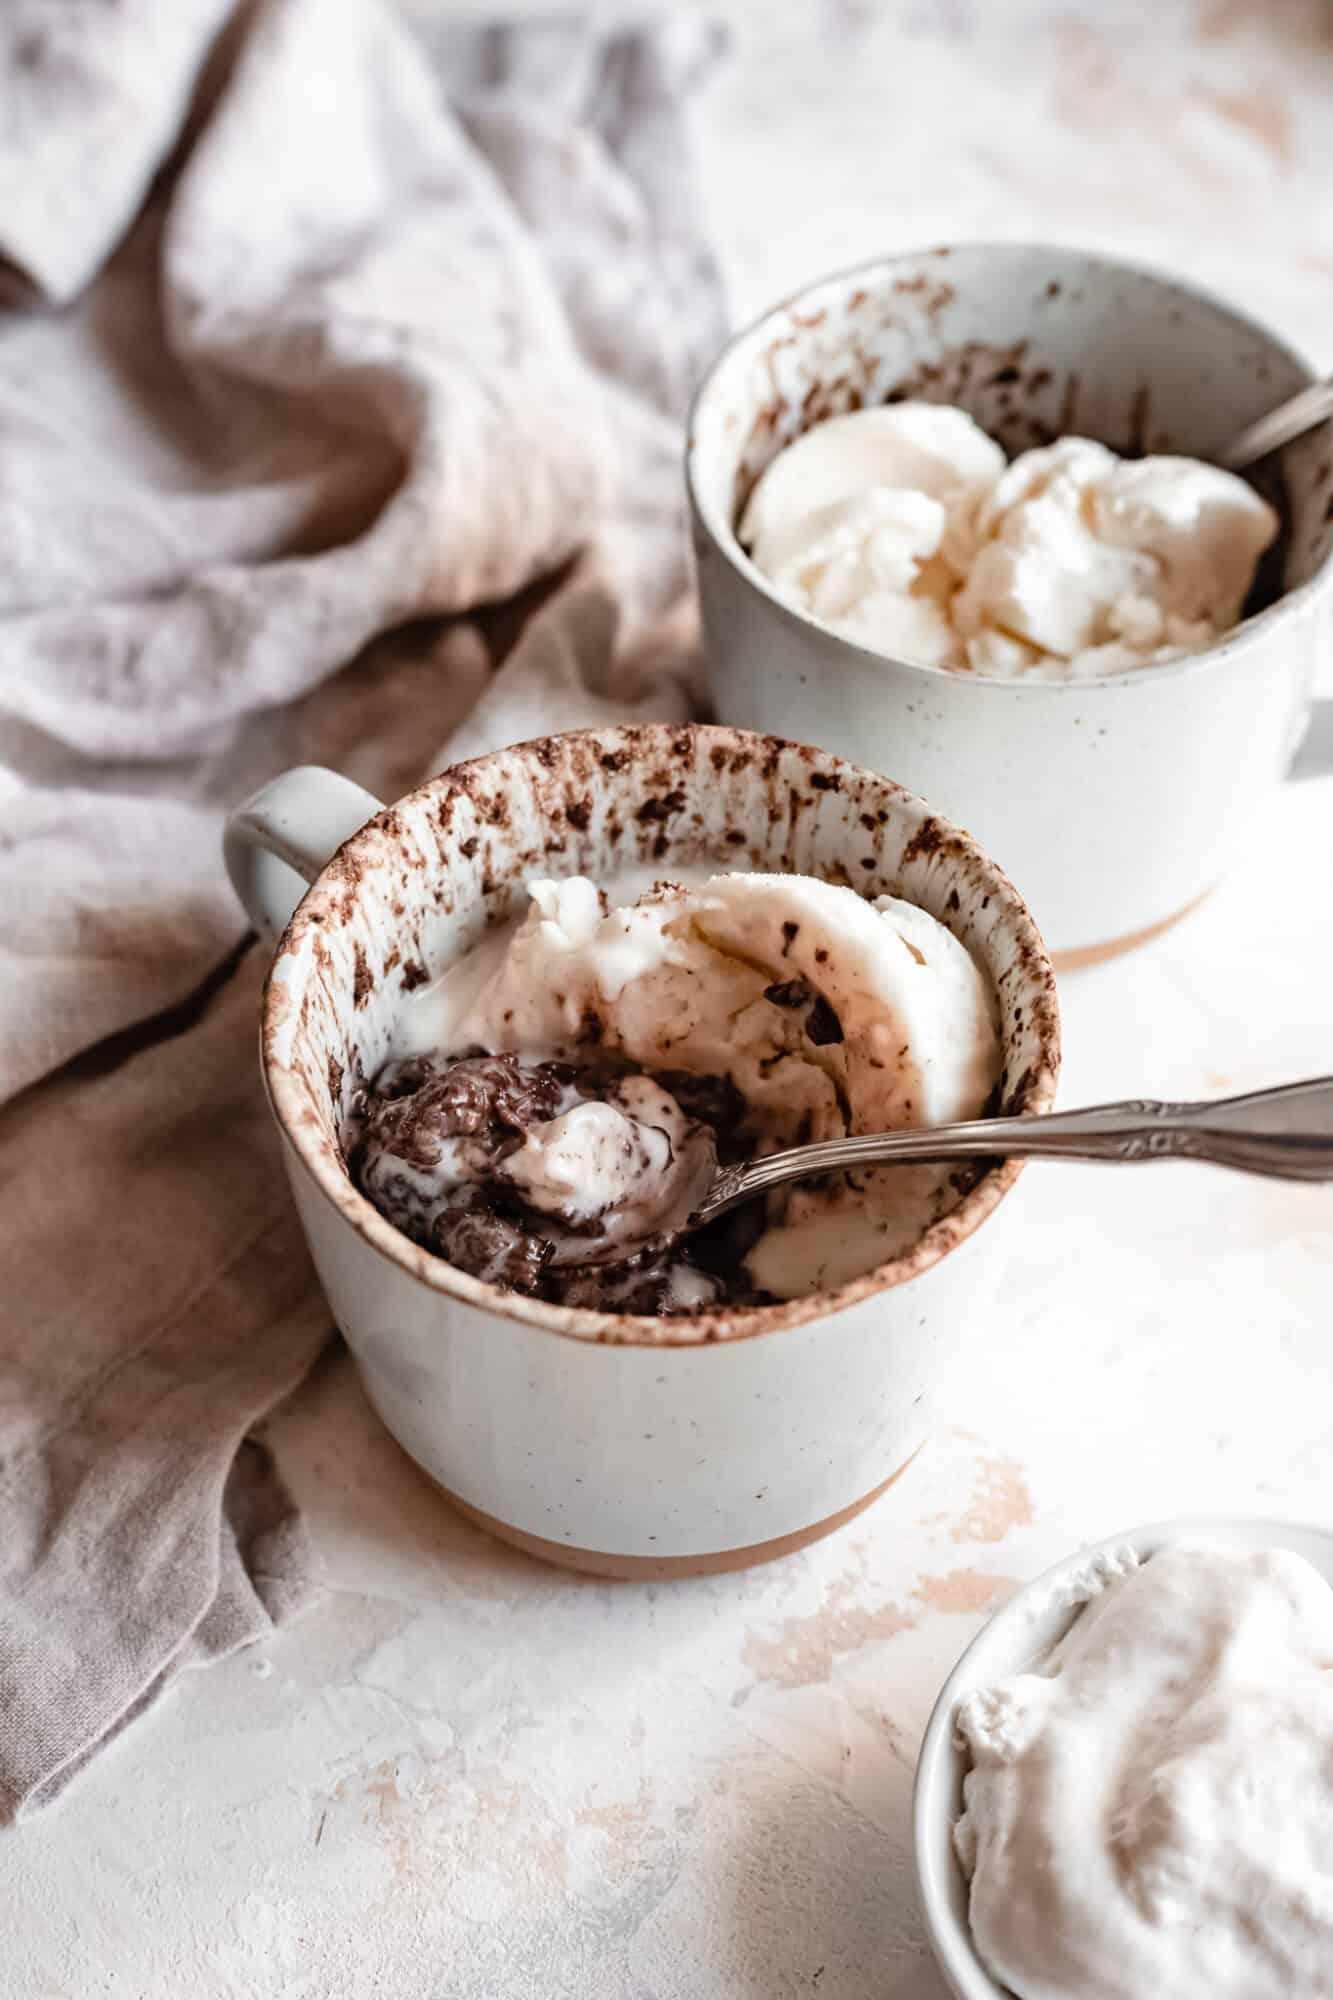 Healthy Vegan Chocolate Mug Cake Sugar Free Gf The Banana Diaries